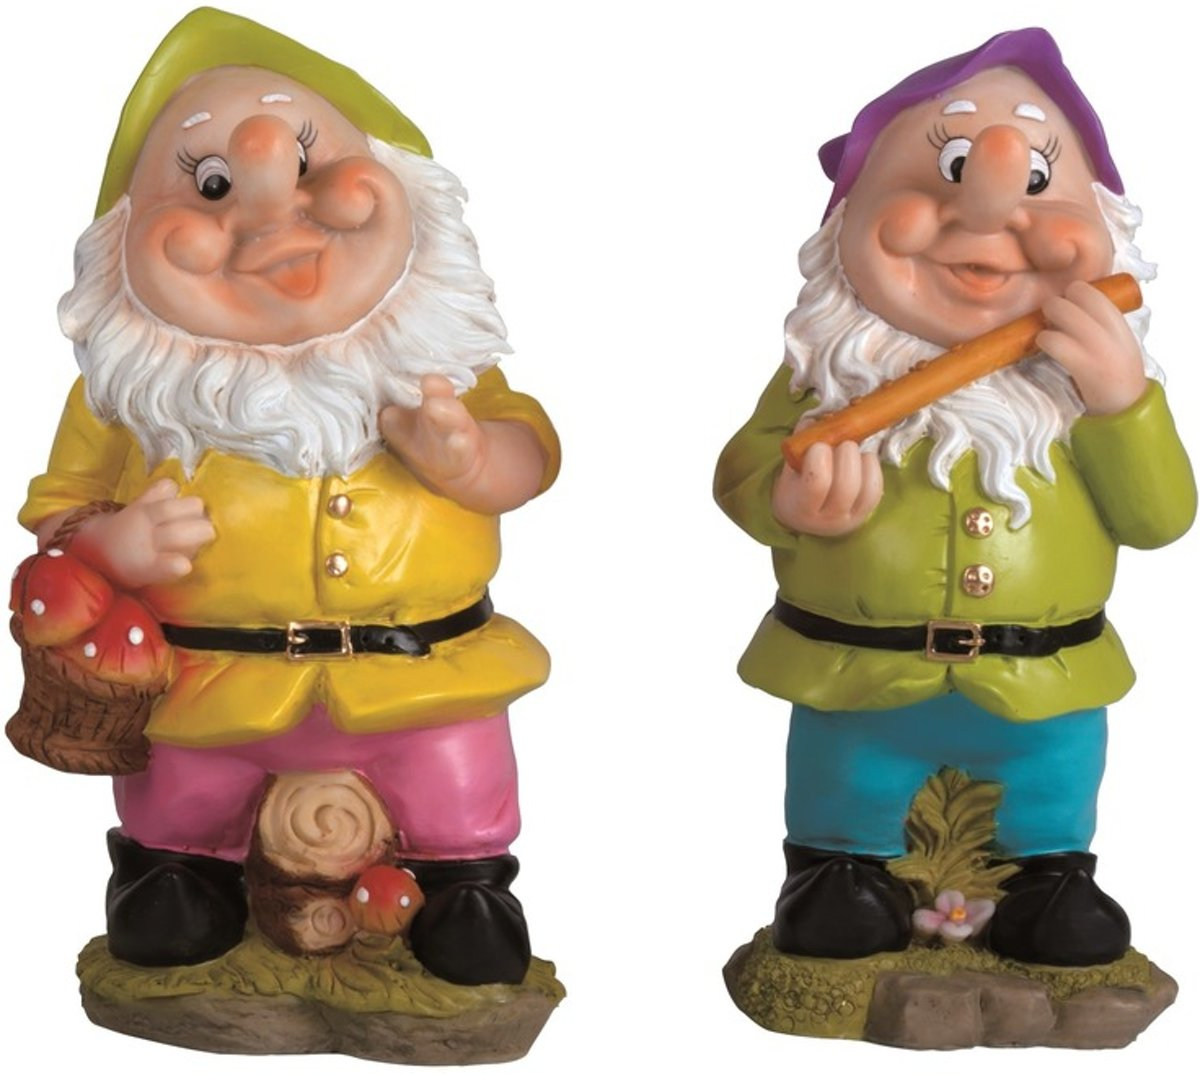 2x Tuinkabouters 30 cm groene/paarse mutsjes